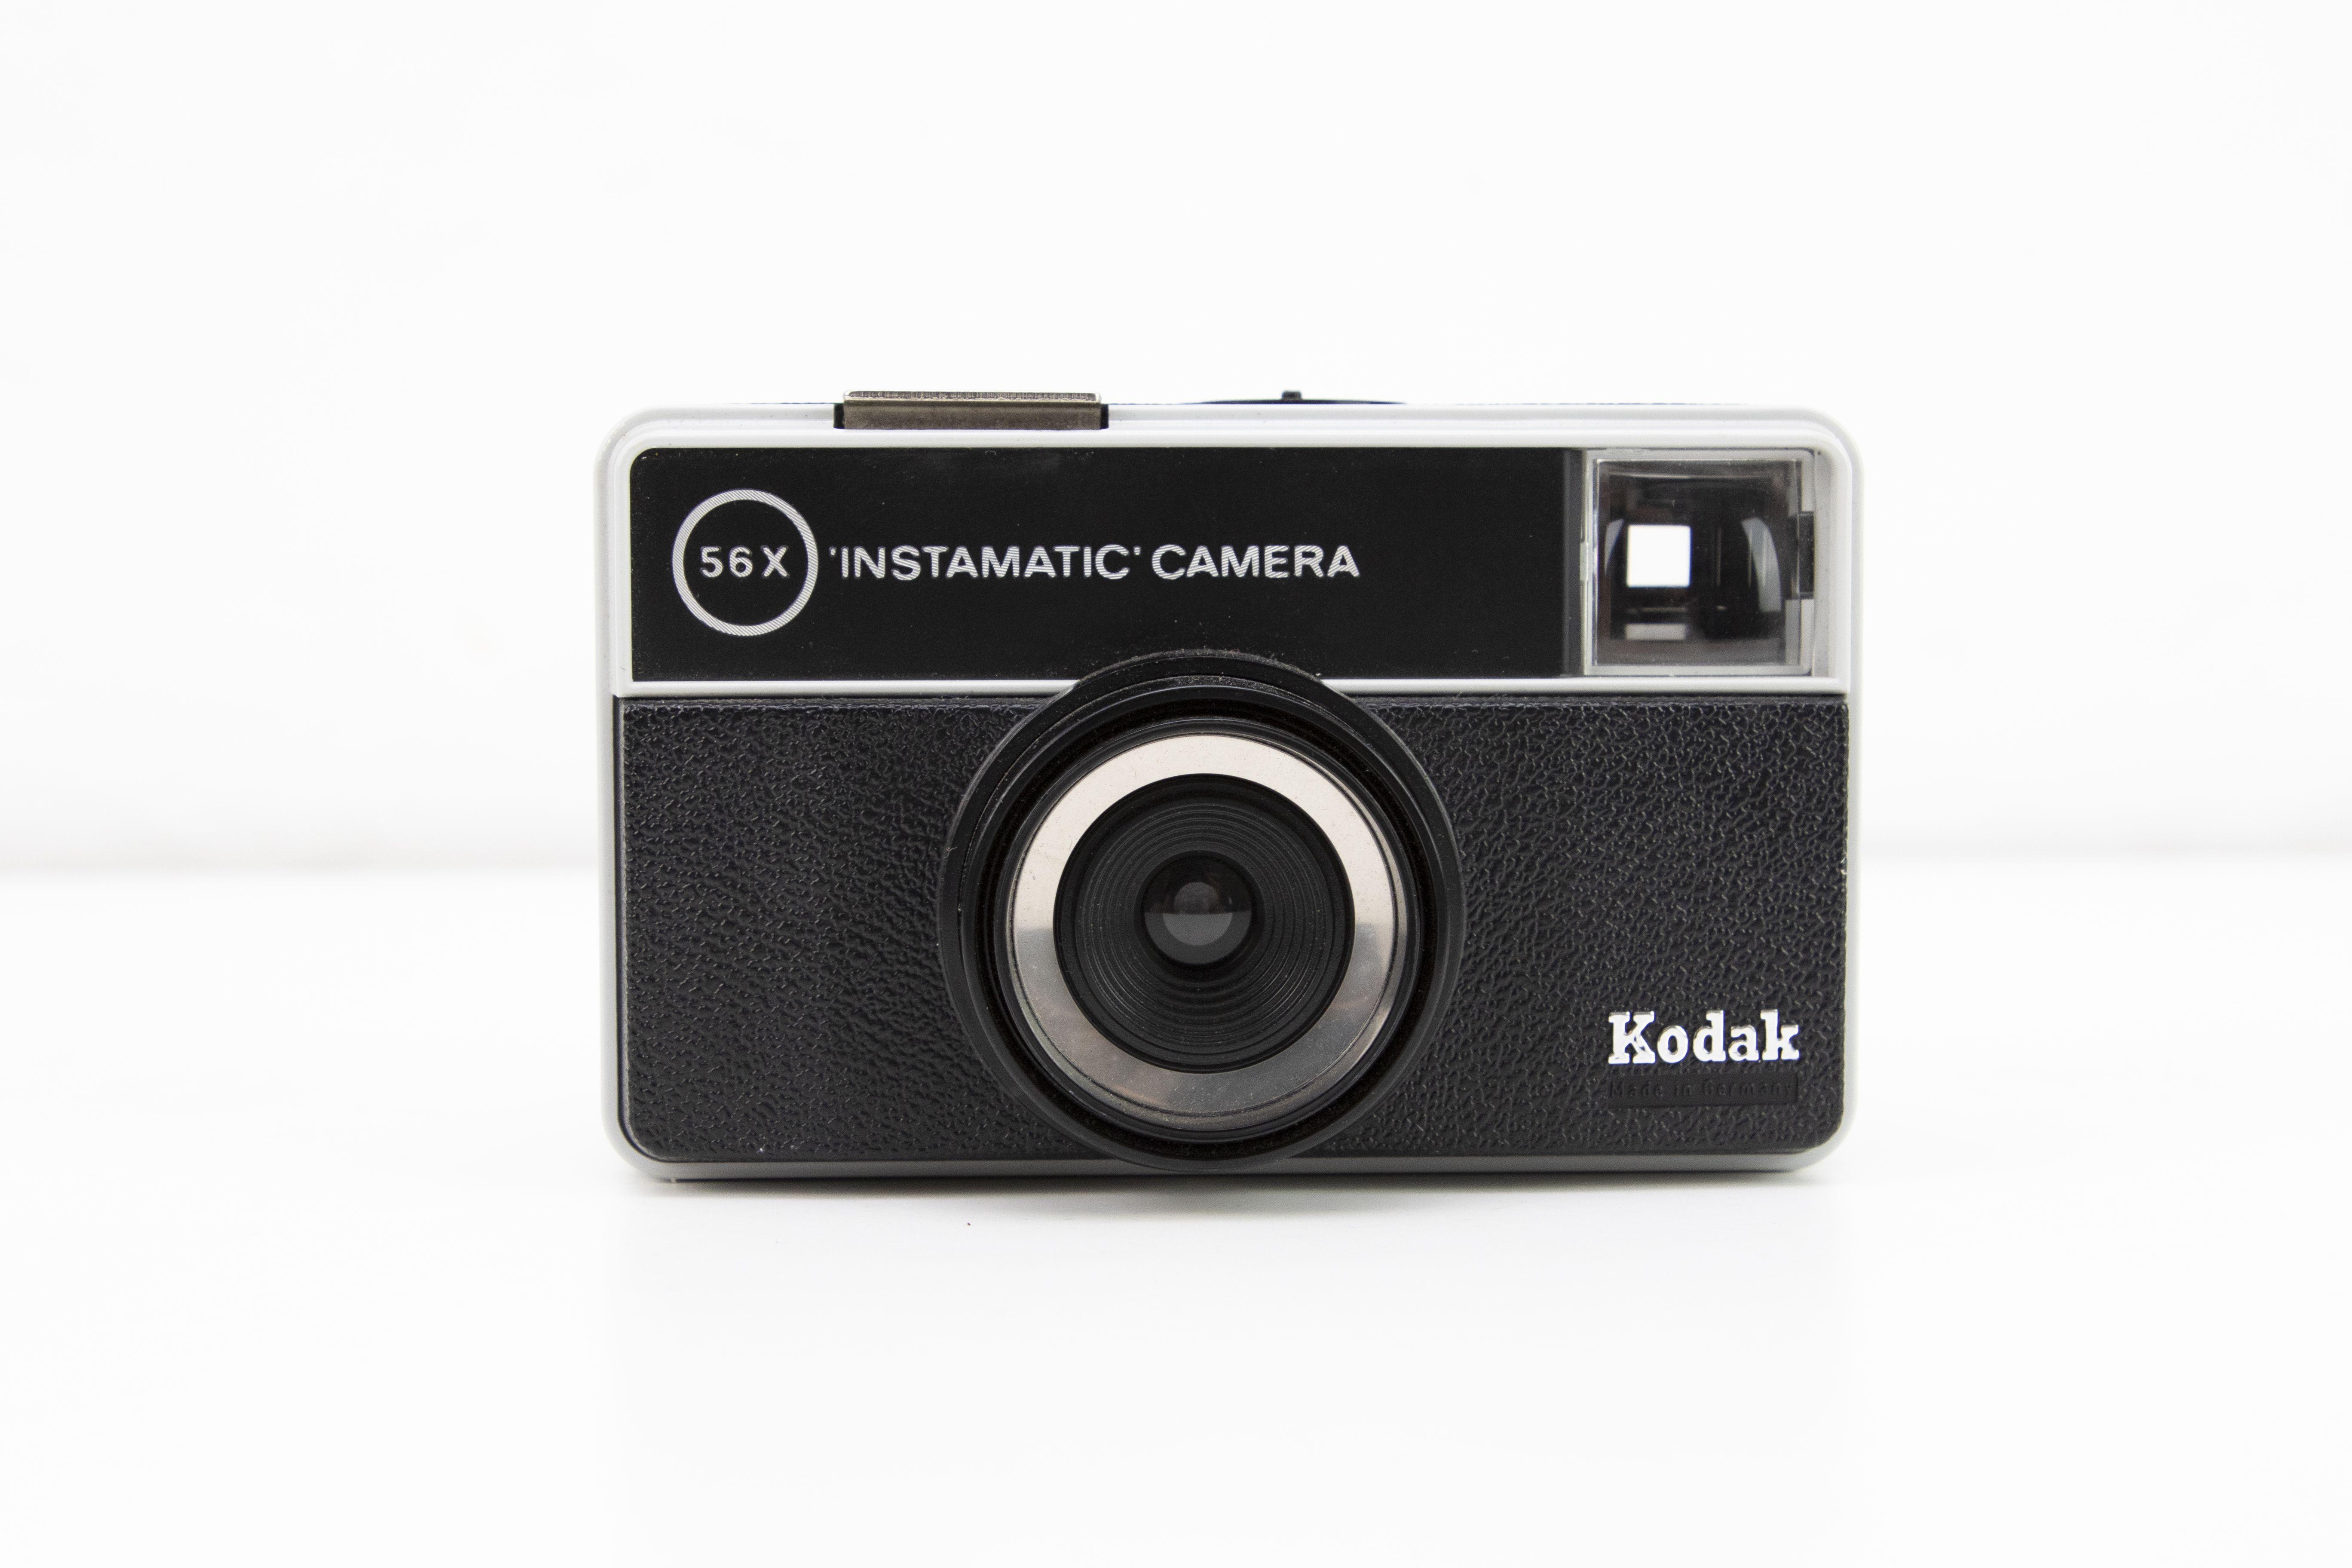 Kodak Film Camera 80s 90s Vintage 56x Instamatic Camera Photography Vintage Accessories Made In Italy Discount Instamatic Camera Camera Photography Kodak Film Camera